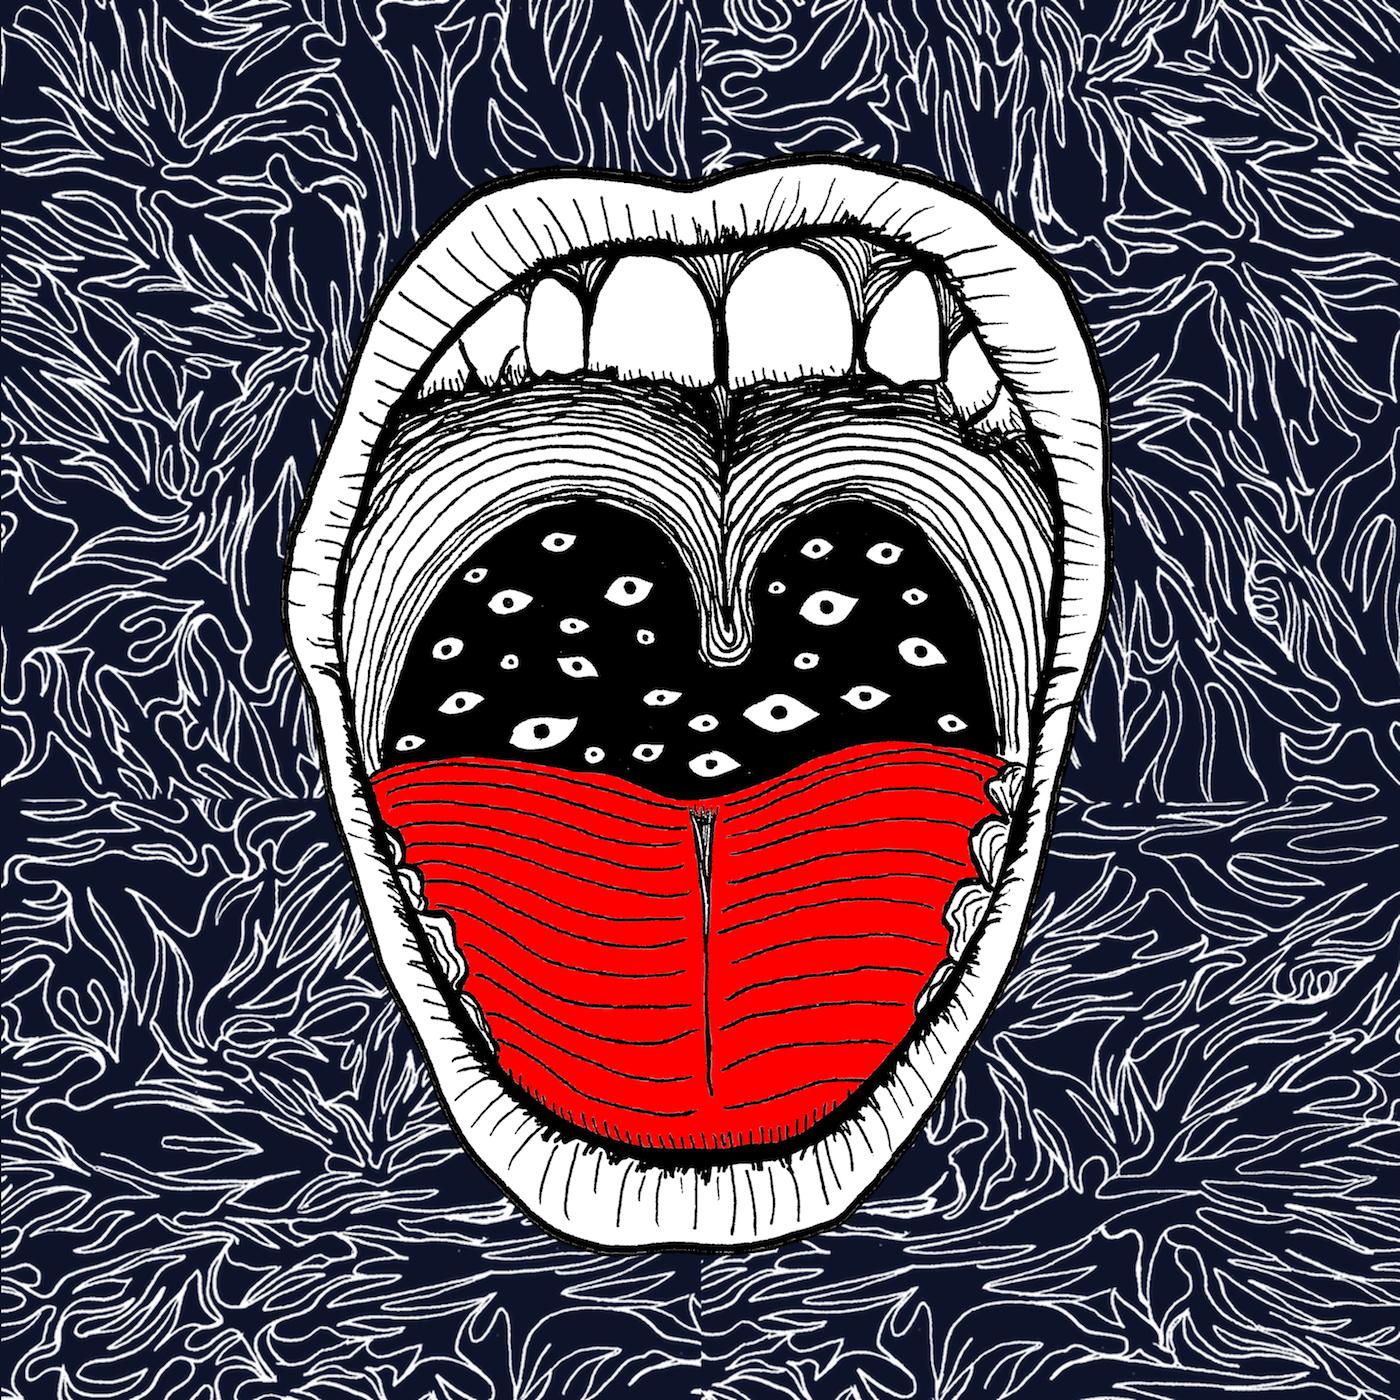 Swallow Me Whole Album Art 1400x1400 (1).jpg